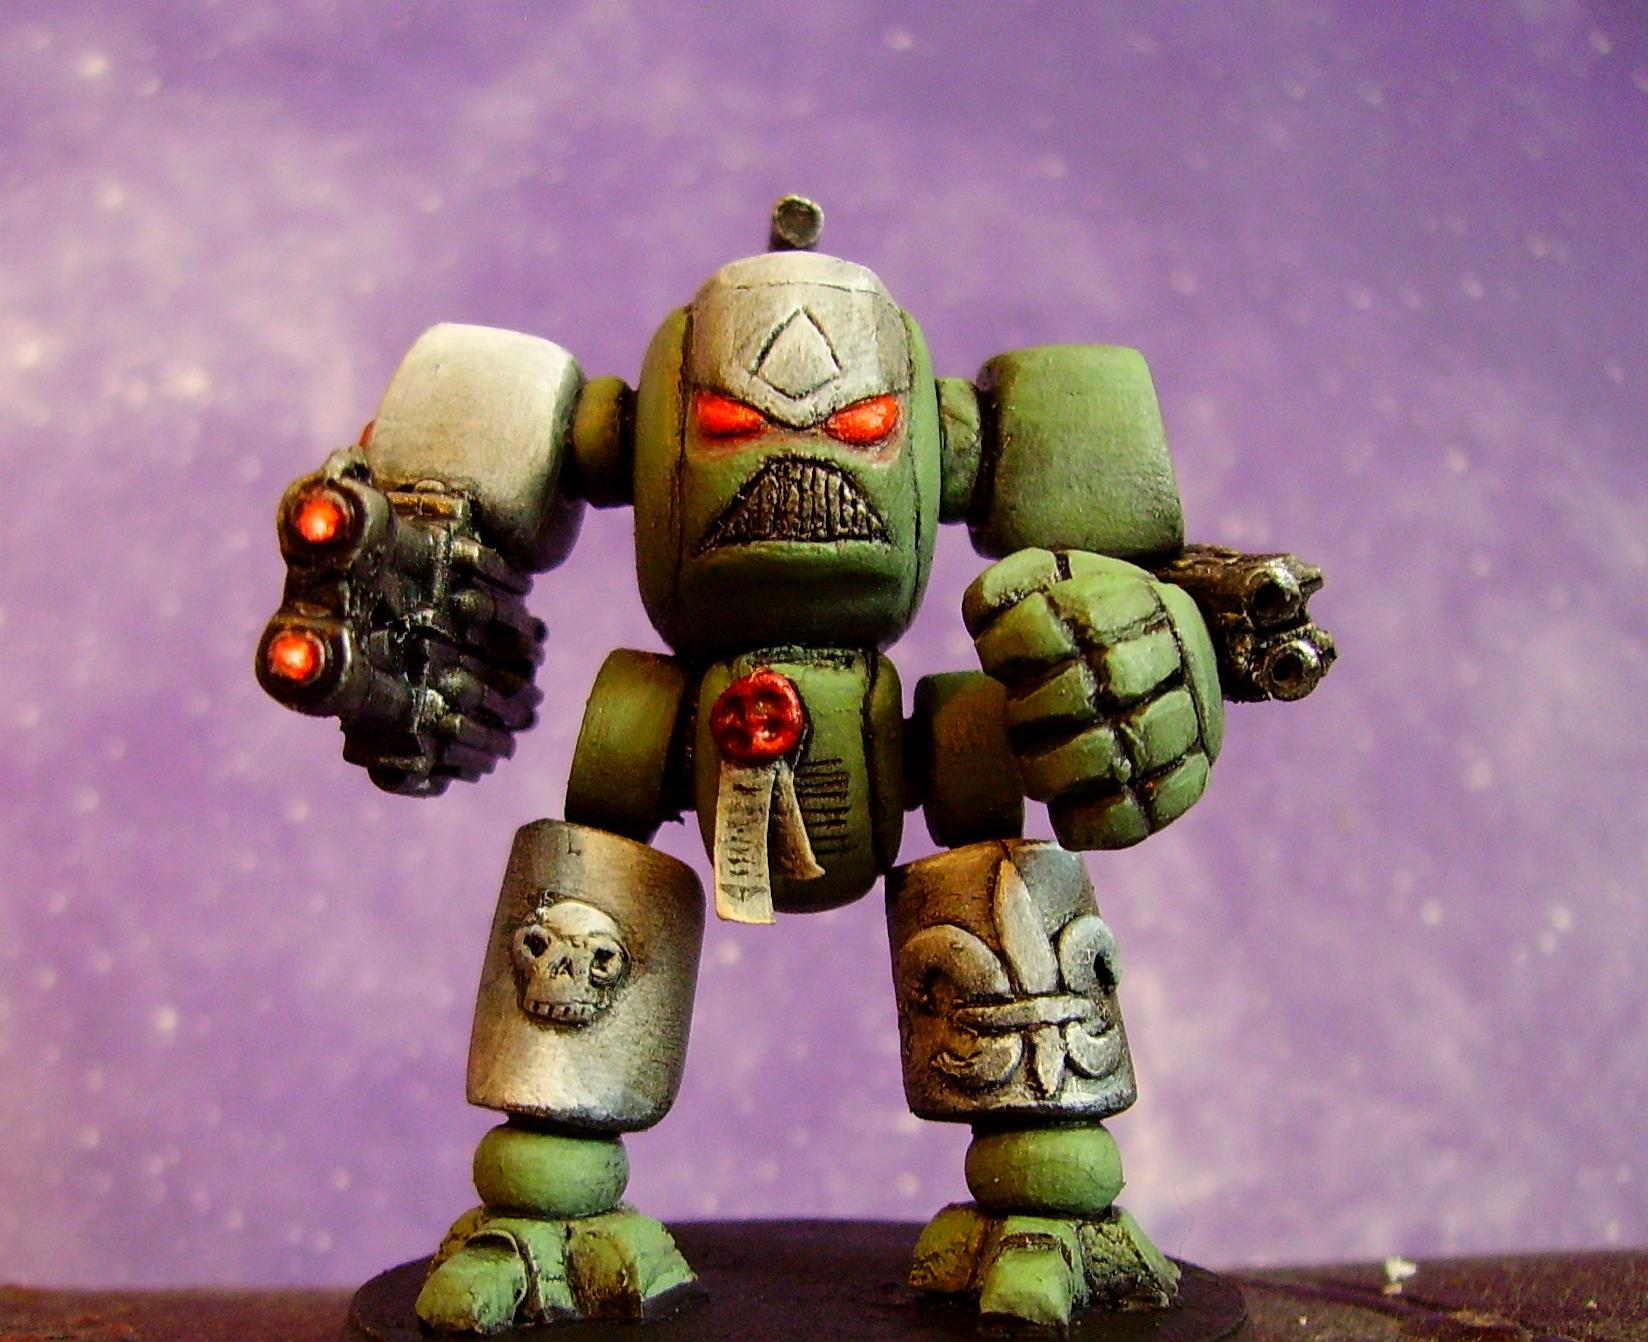 Dreadnought, Dred, Rogue Tarder, Rt, Scratch Build